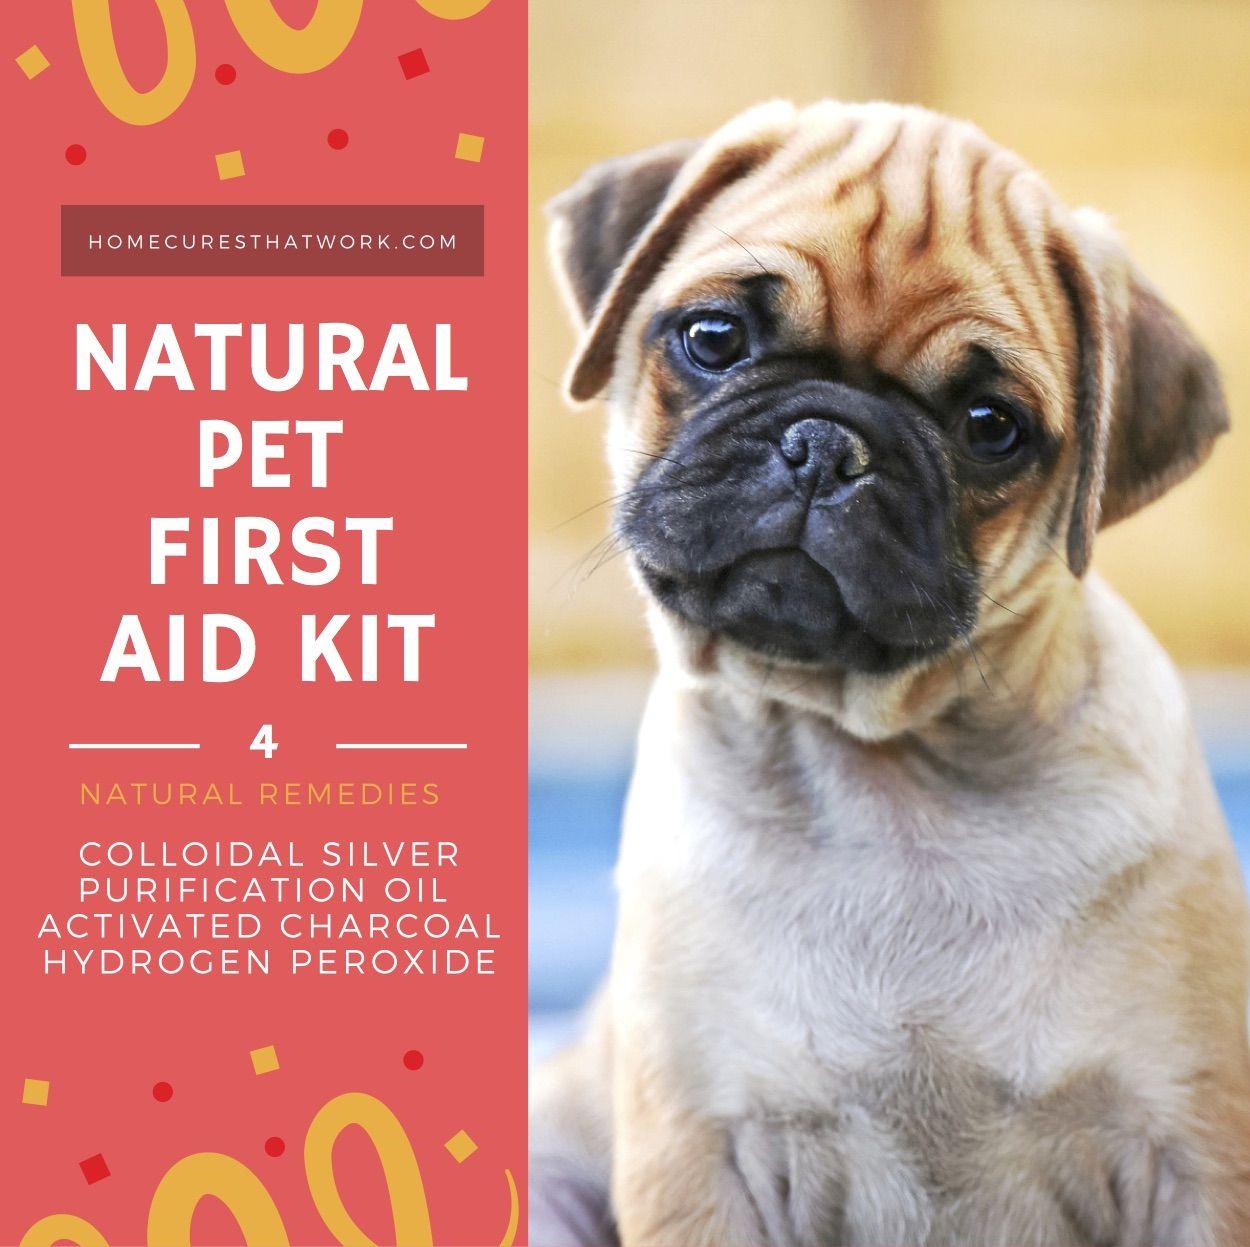 Natural Remedies For Healthy Pets Healthy Pets Cheap Pet Insurance Pet Insurance Reviews